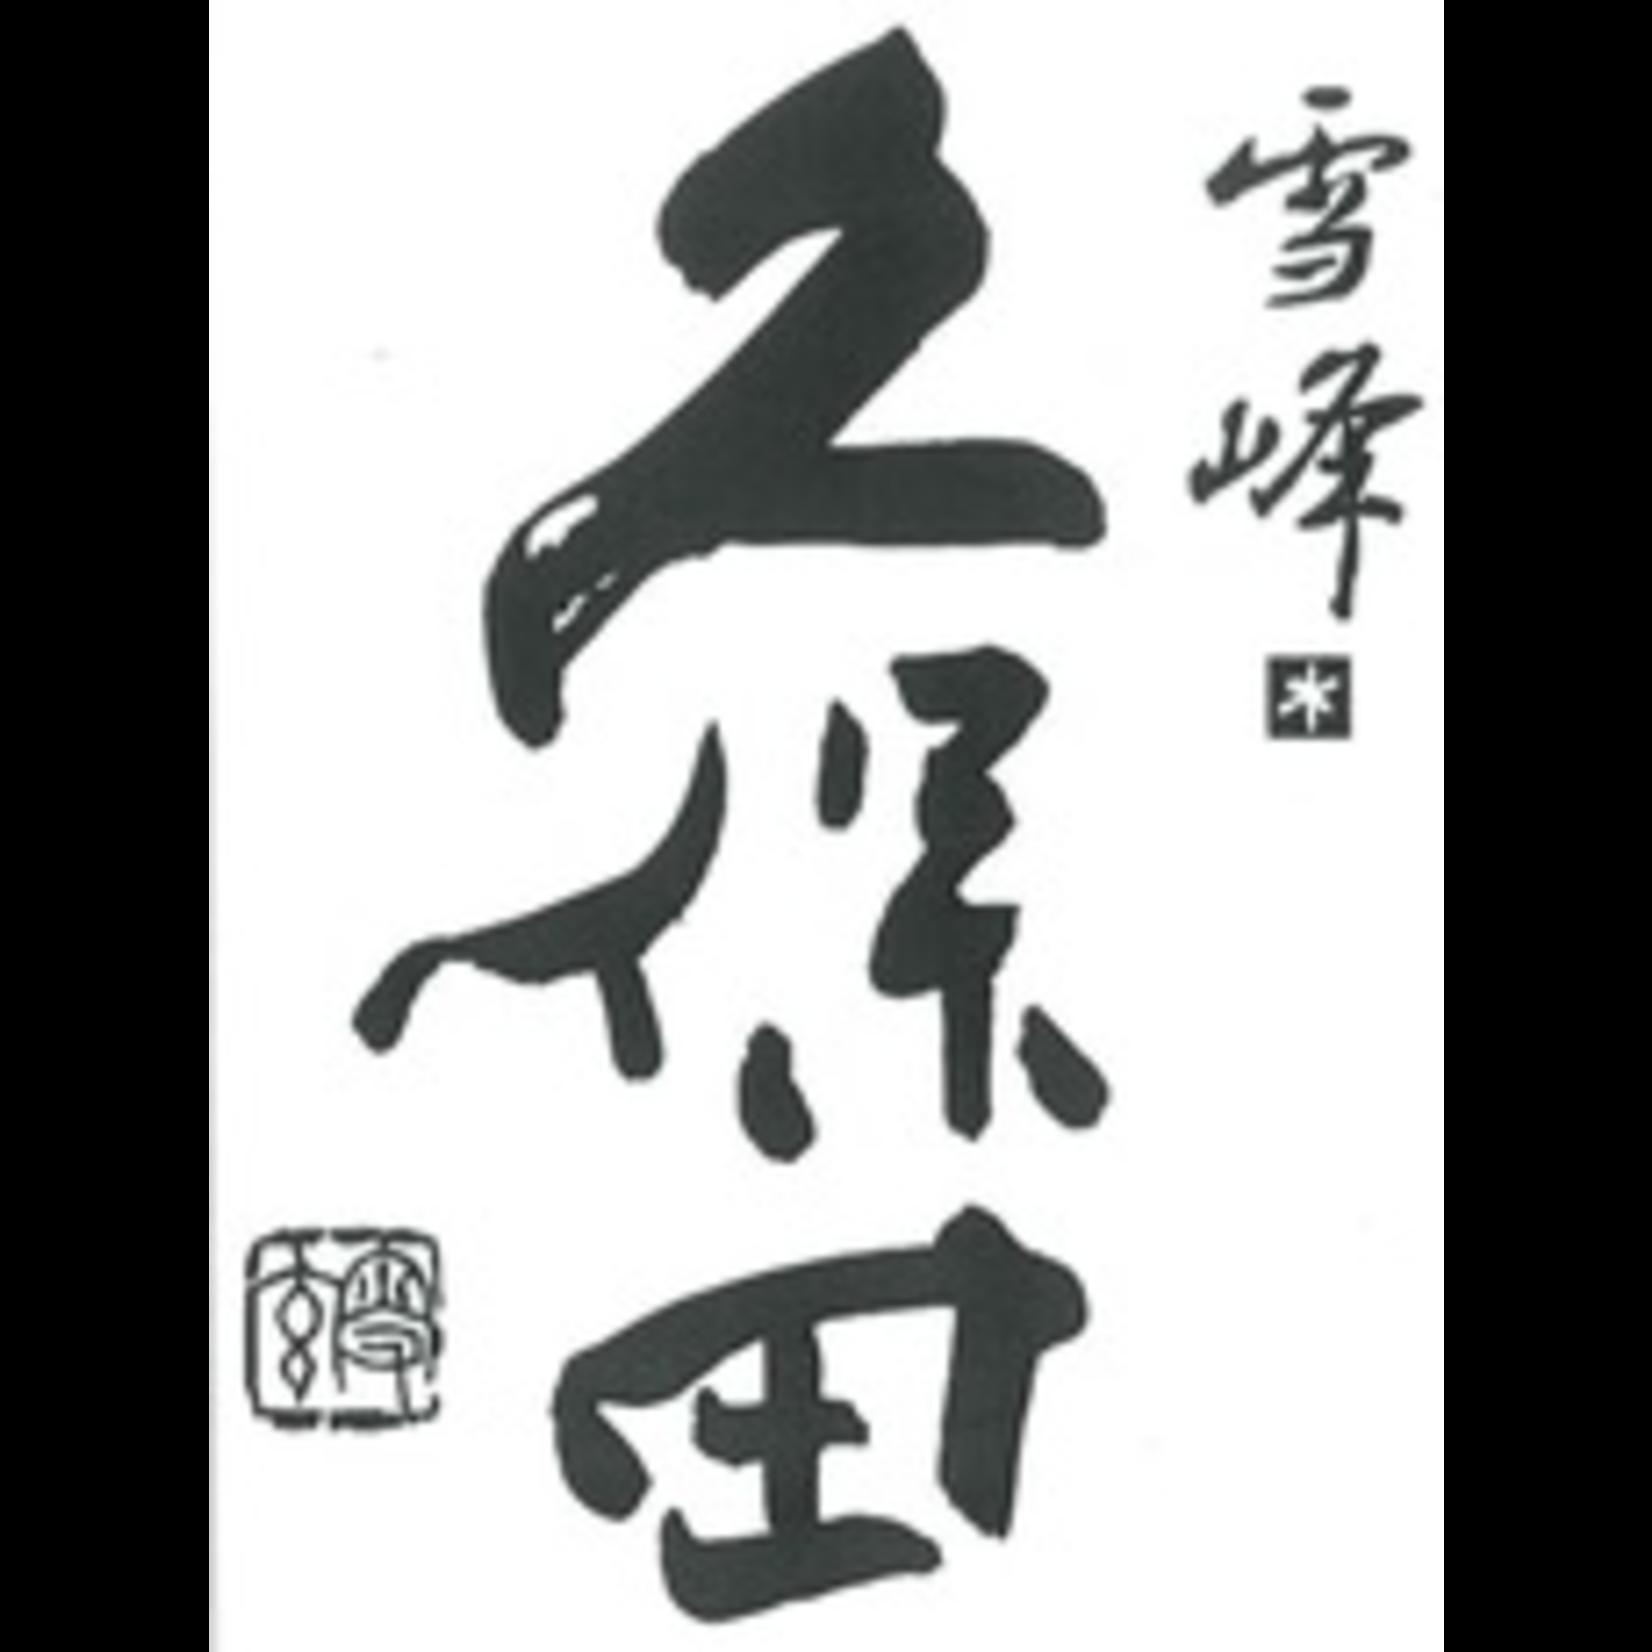 Asahi Shuzo (Niigata), Soujo Kubota Seppou Junmai Daiginjo Sake 500ml